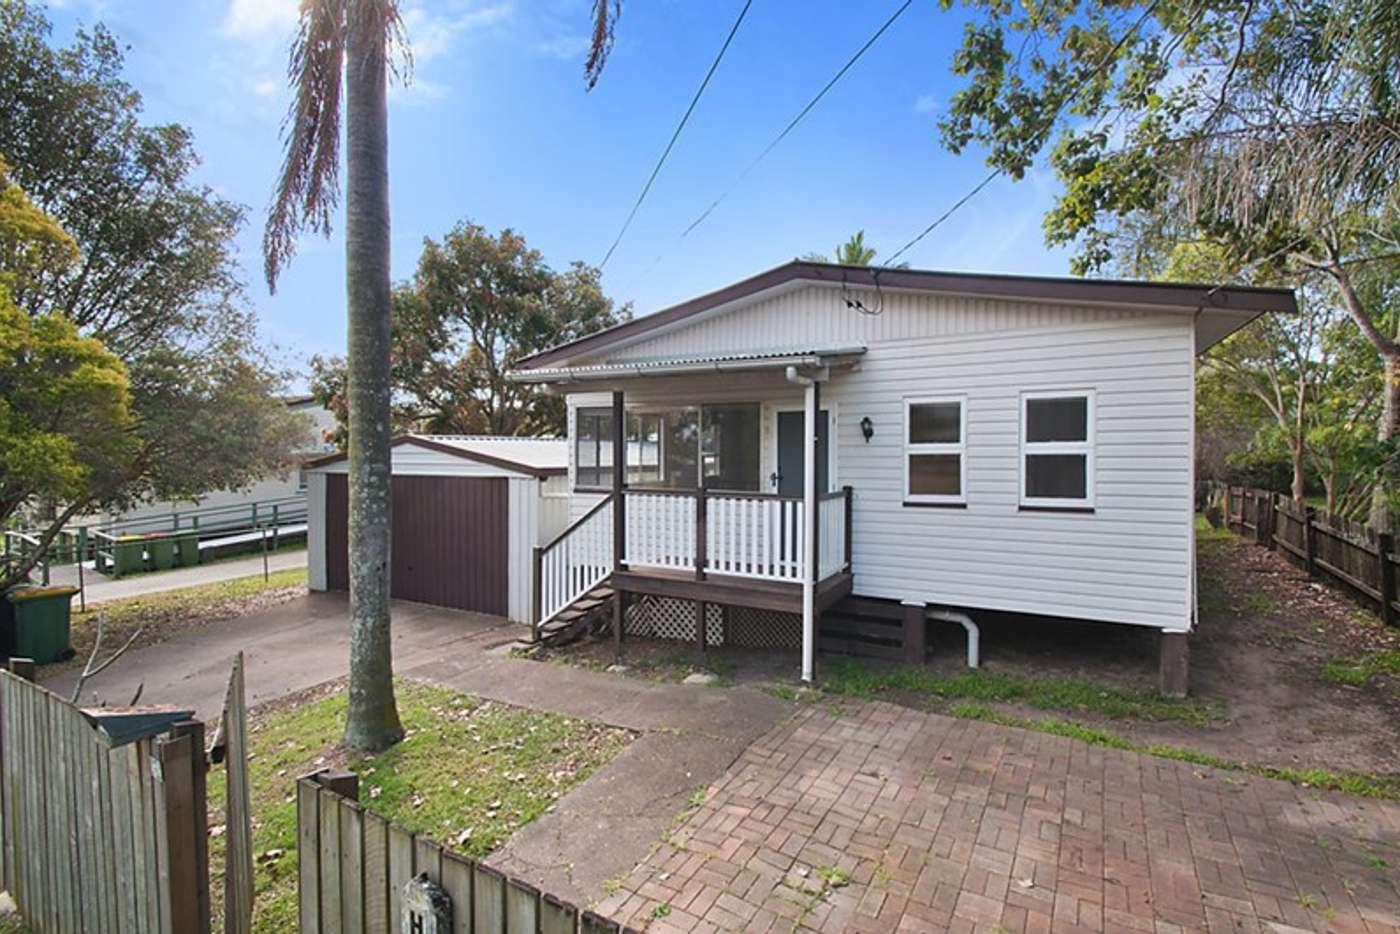 Main view of Homely house listing, 13 Oates Avenue, Woodridge QLD 4114